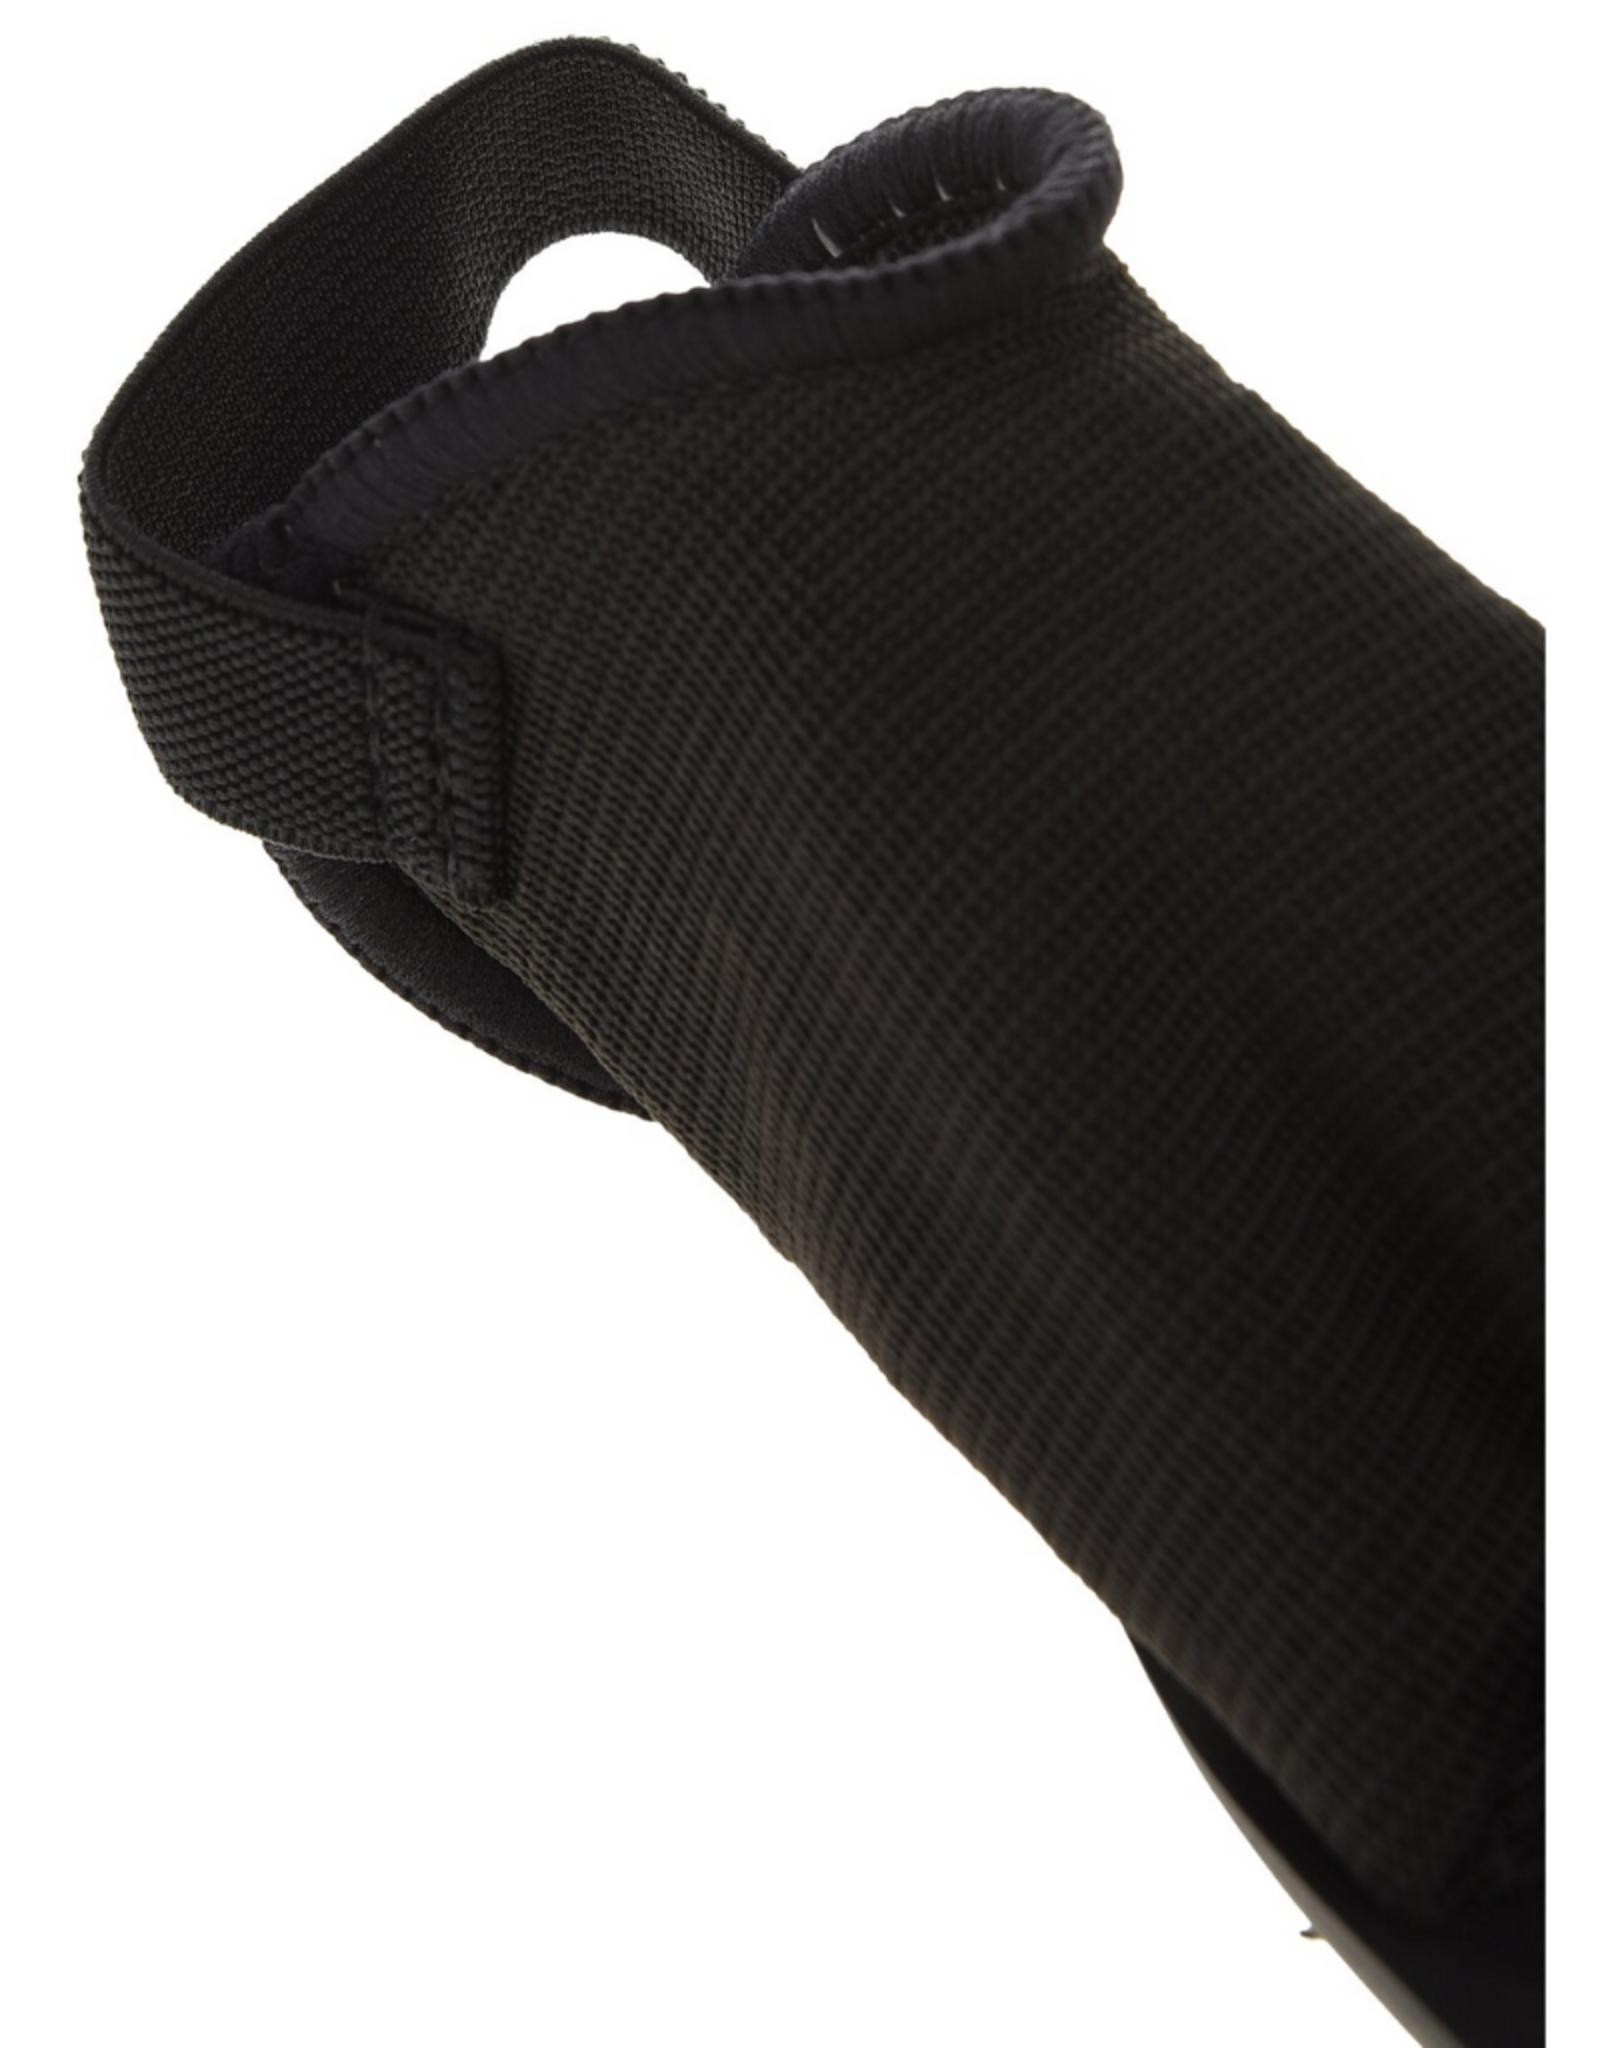 Nike Adult Charge Shin Guard Black